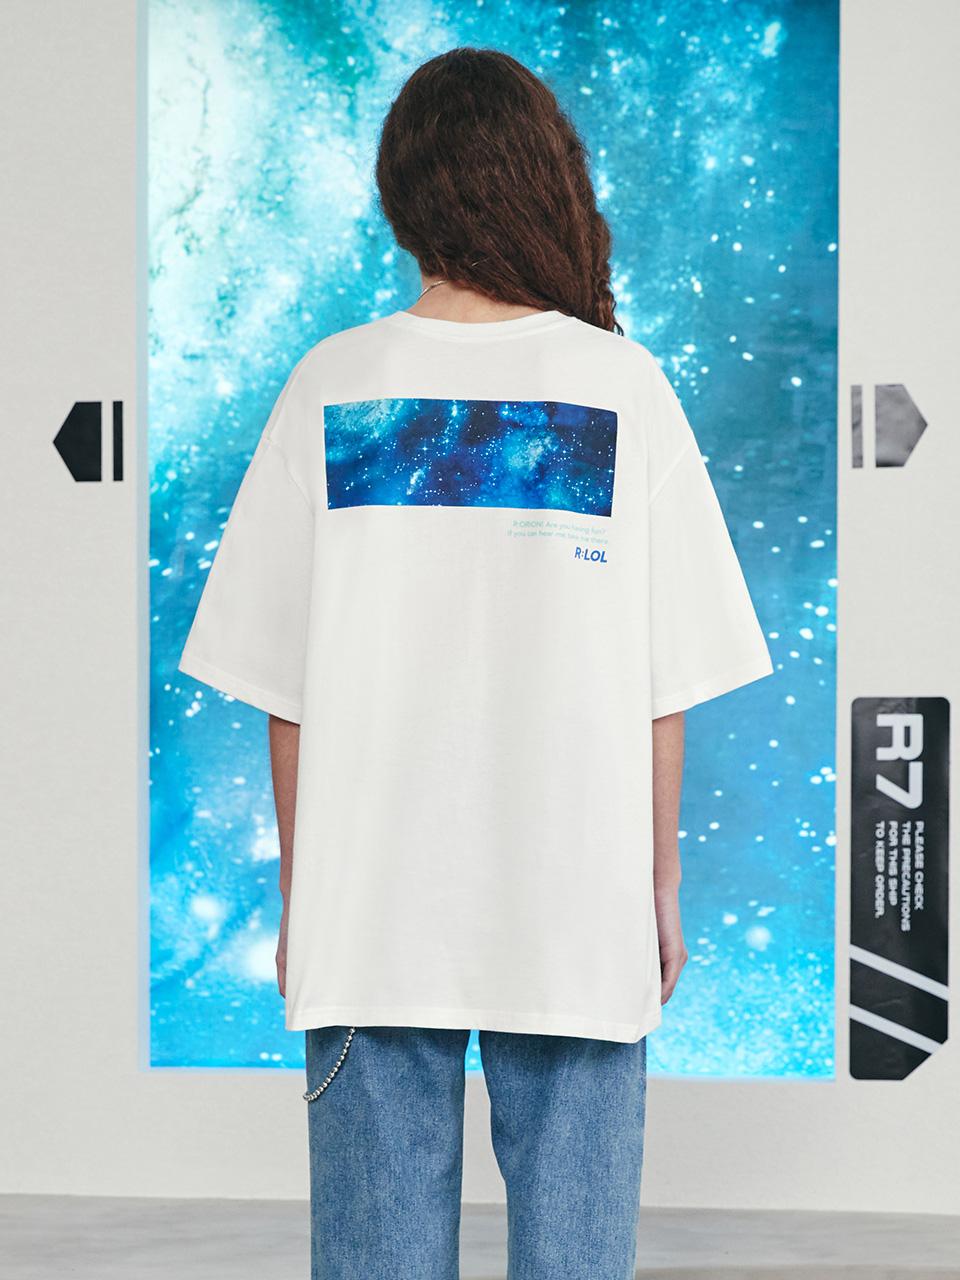 (TS-21324) R:LOL BACK PRINT GALAXY T-SHIRT WHITE